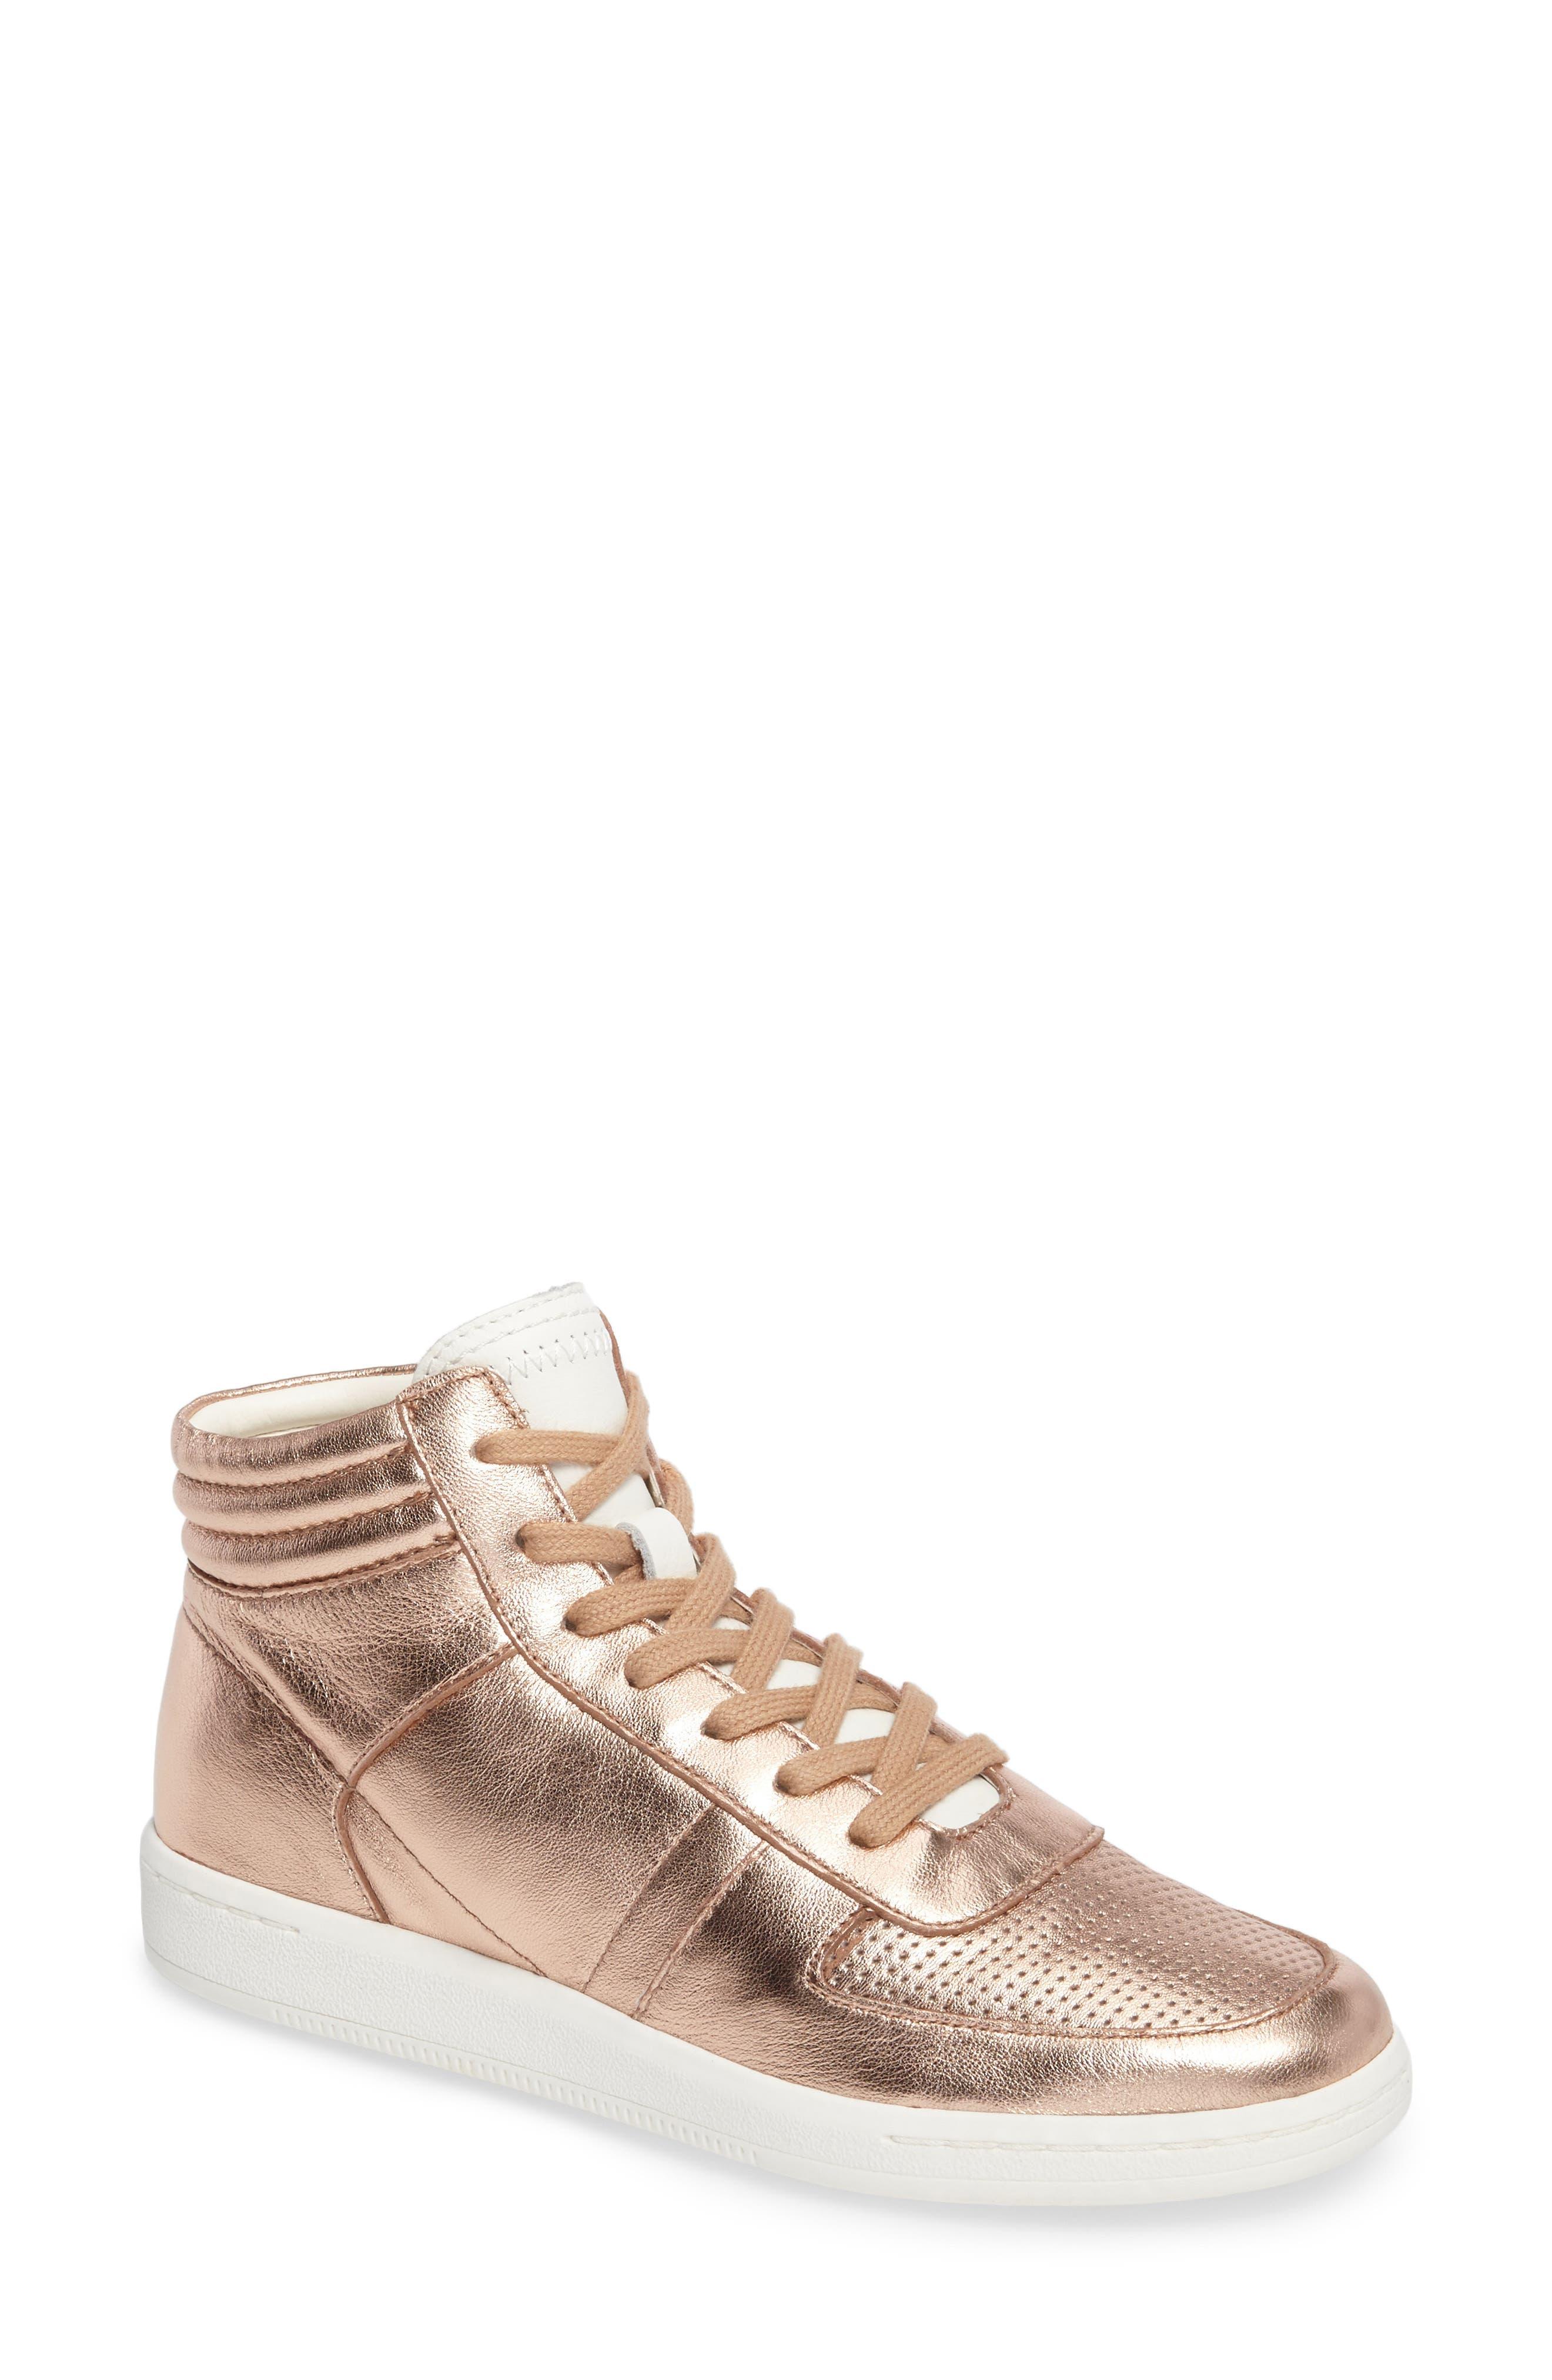 Nate High Top Sneaker,                         Main,                         color,